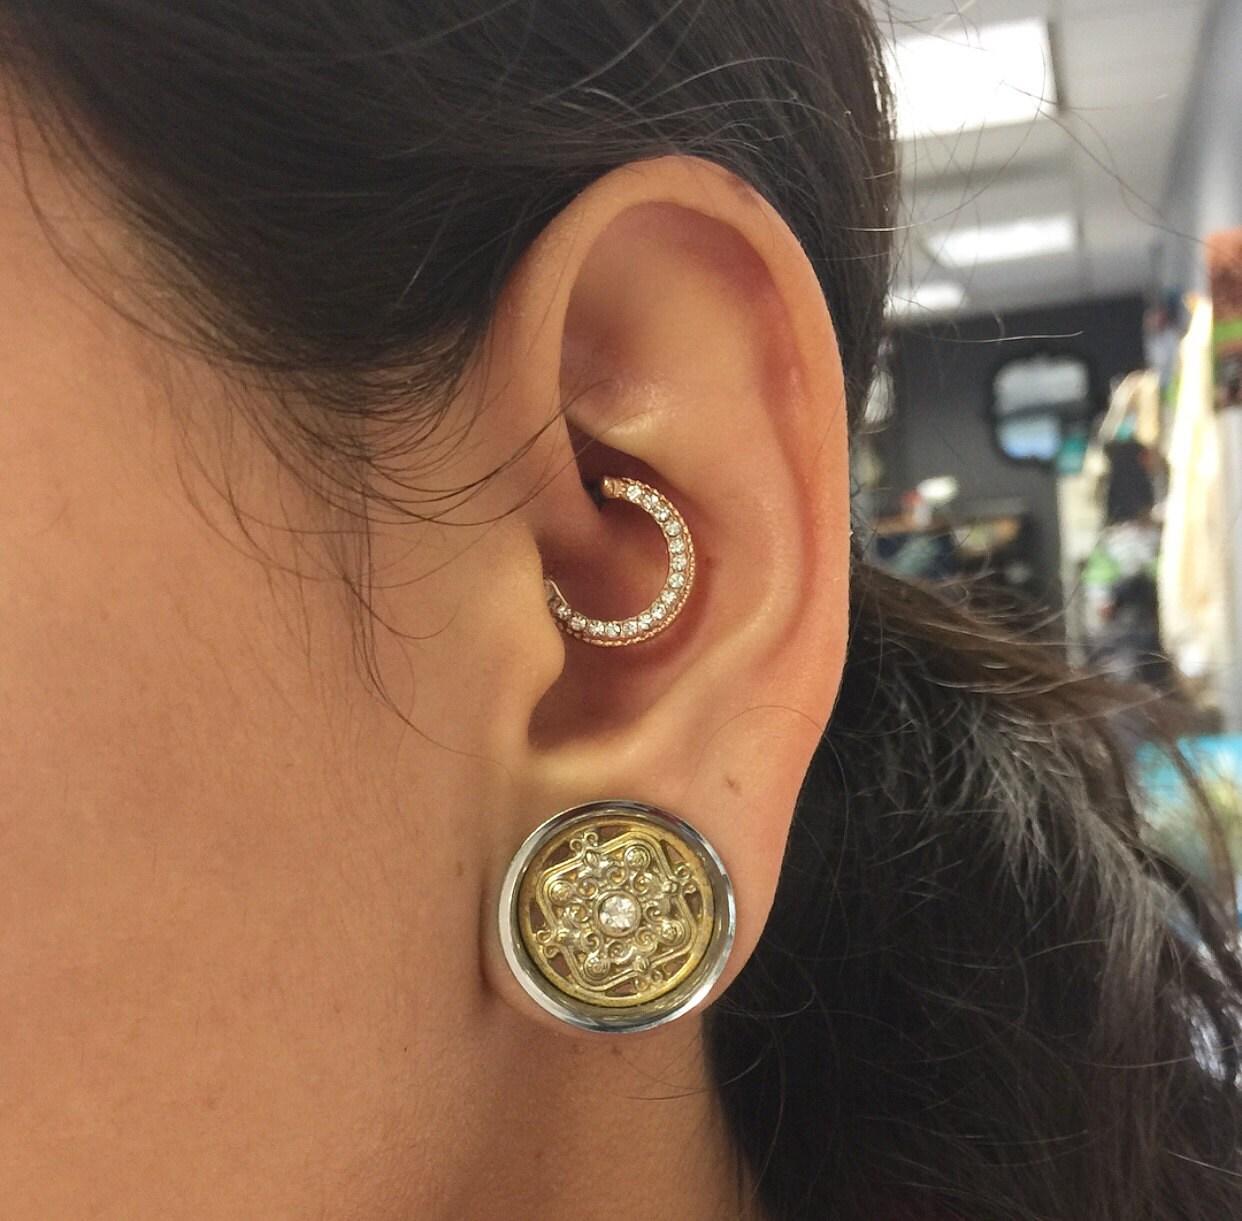 daith piercing rook earring hoop rose gold clicker